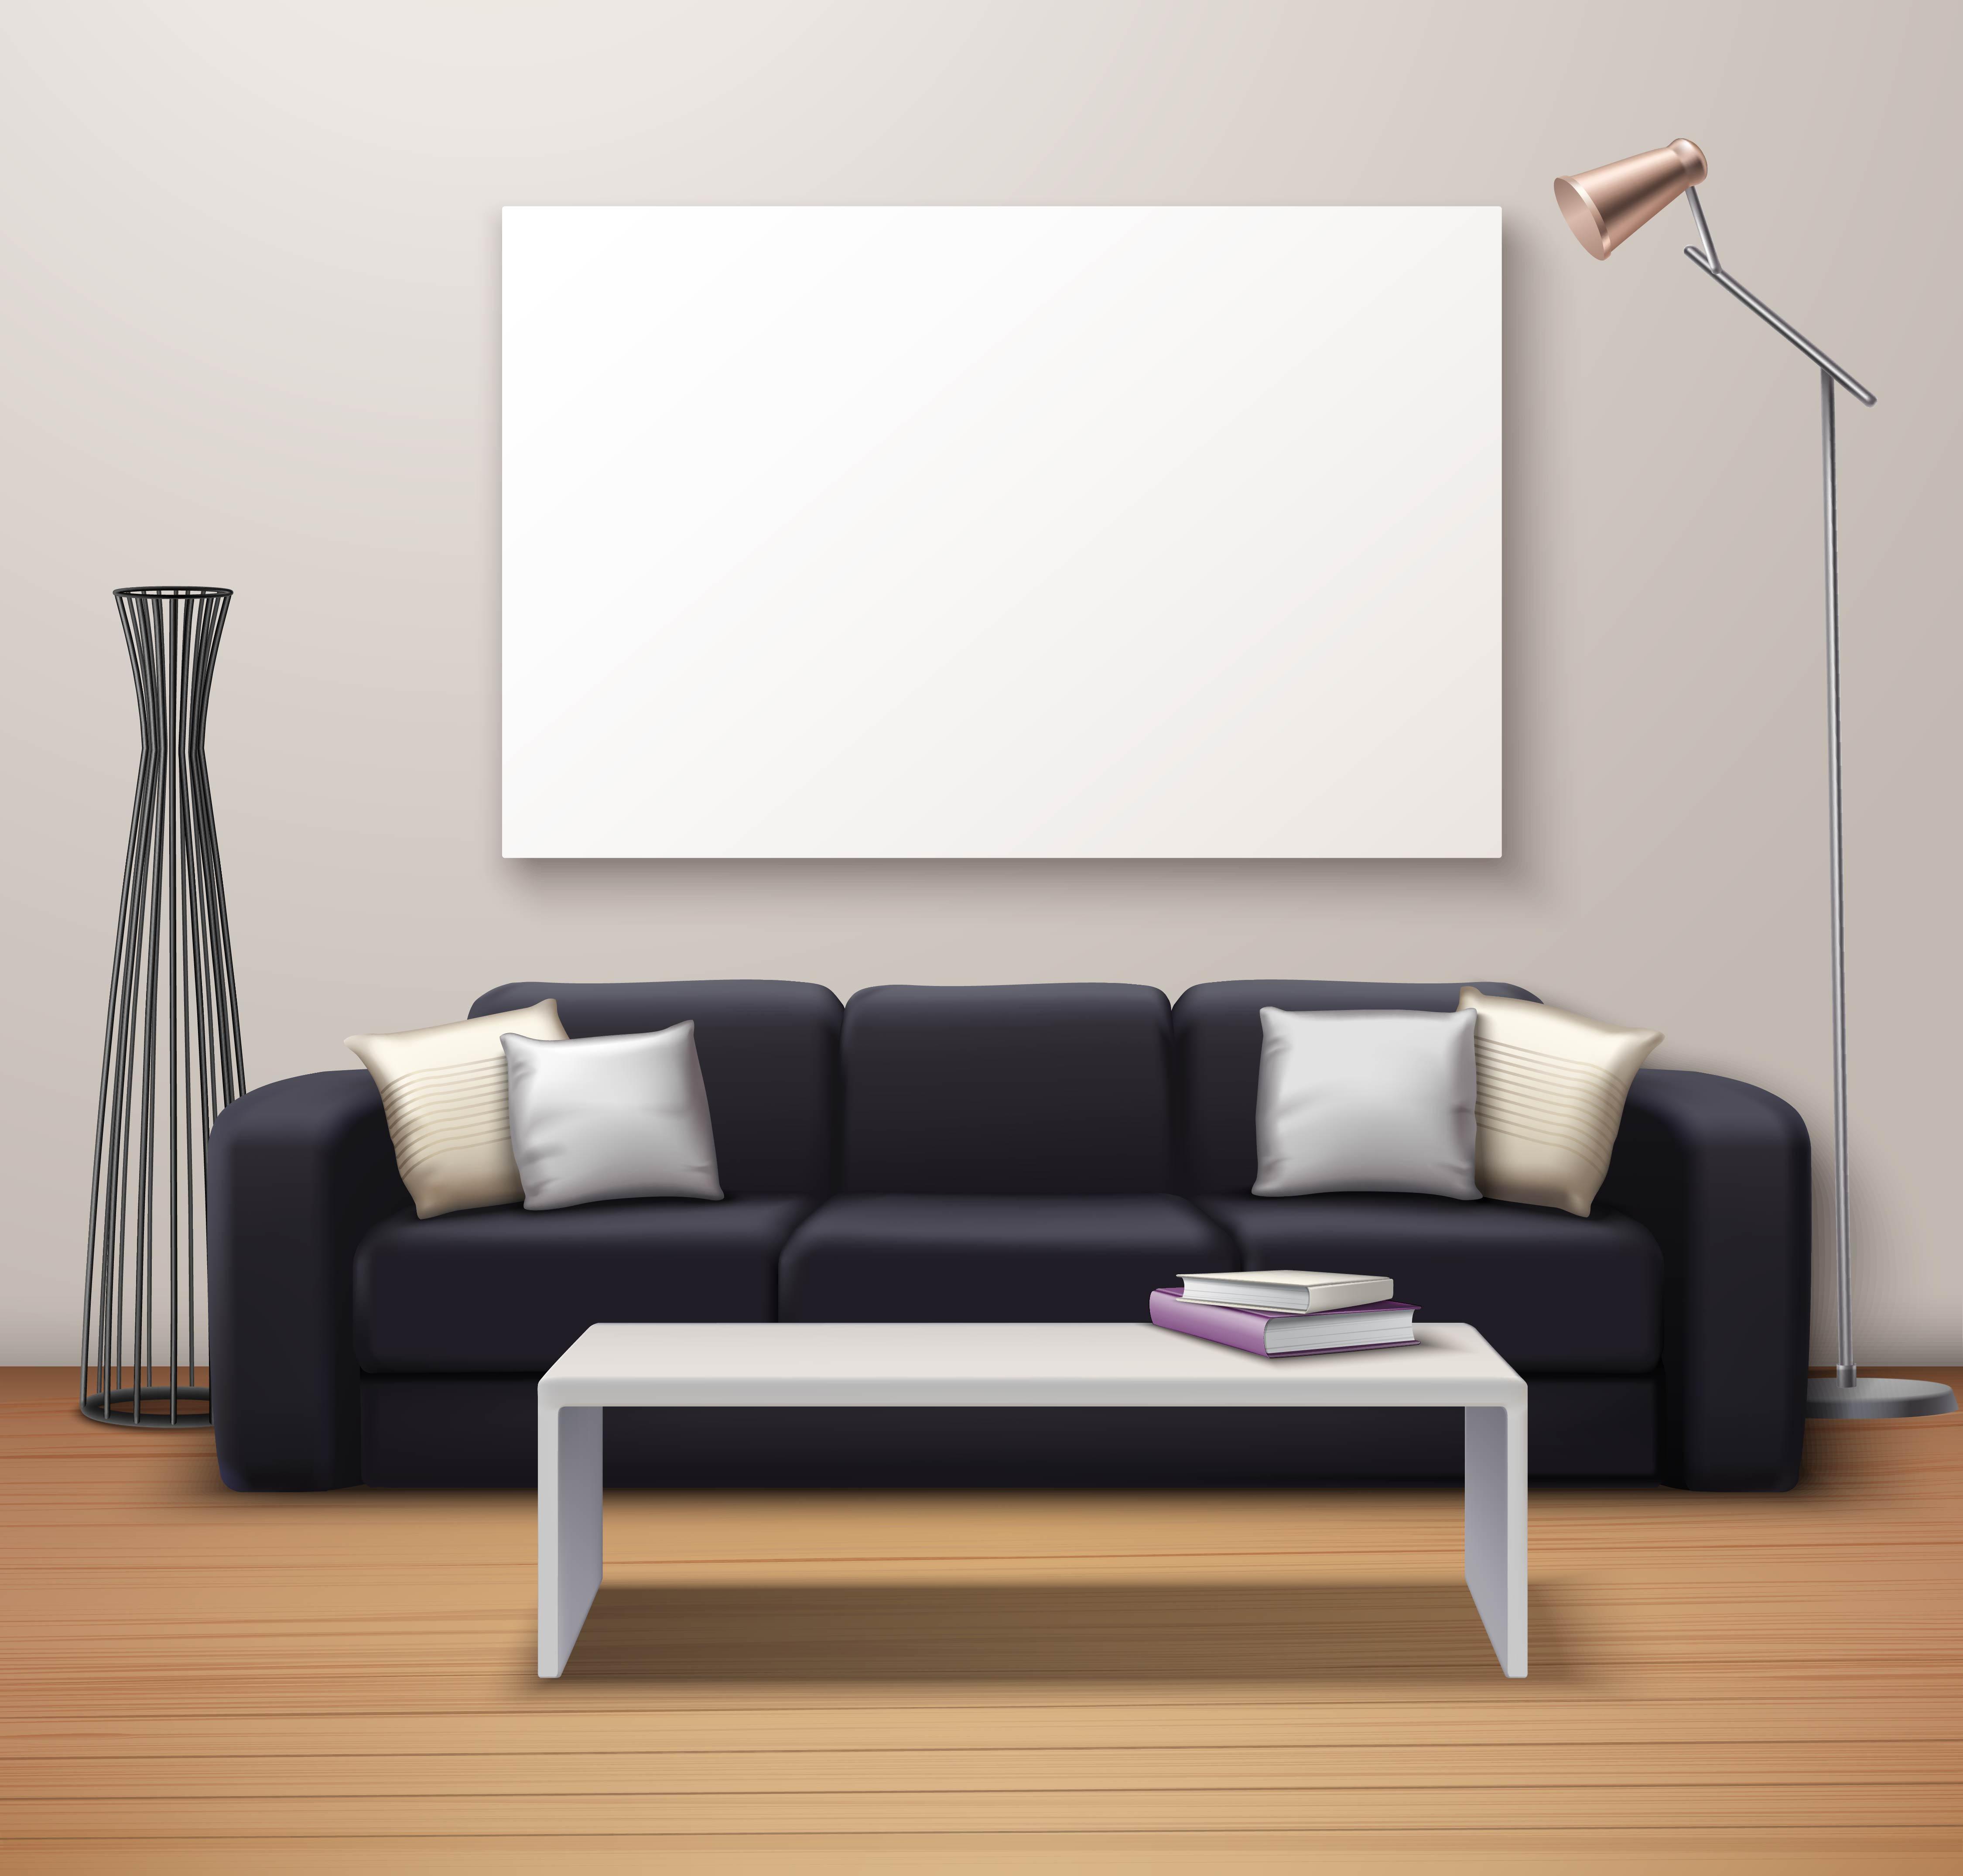 Modern Interior Mockup Realistic Poster